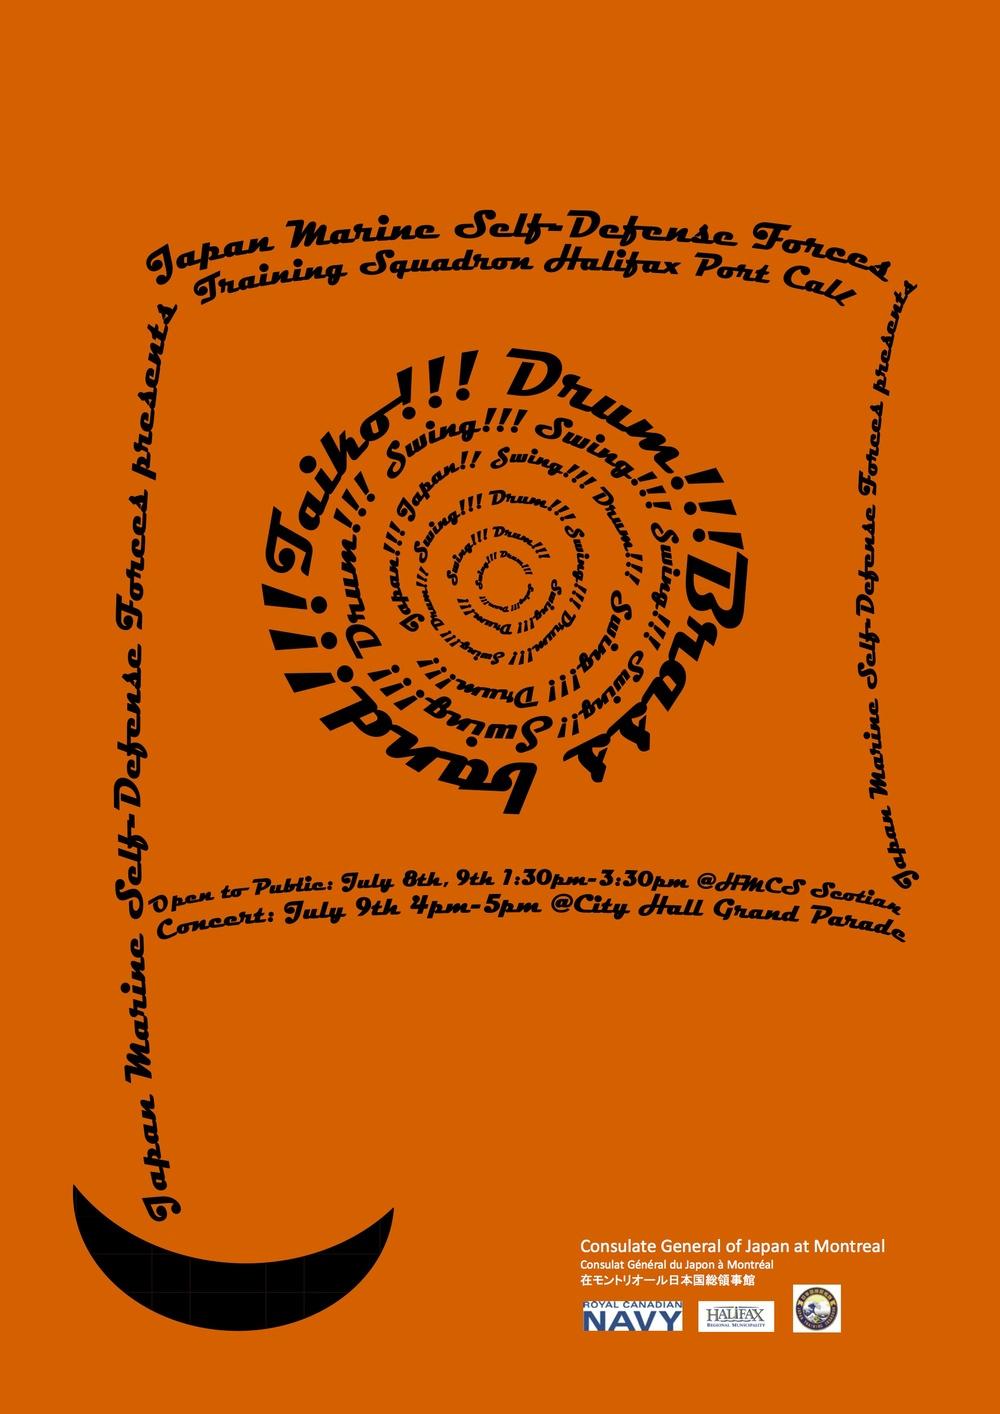 halifax concert flyer.jpg